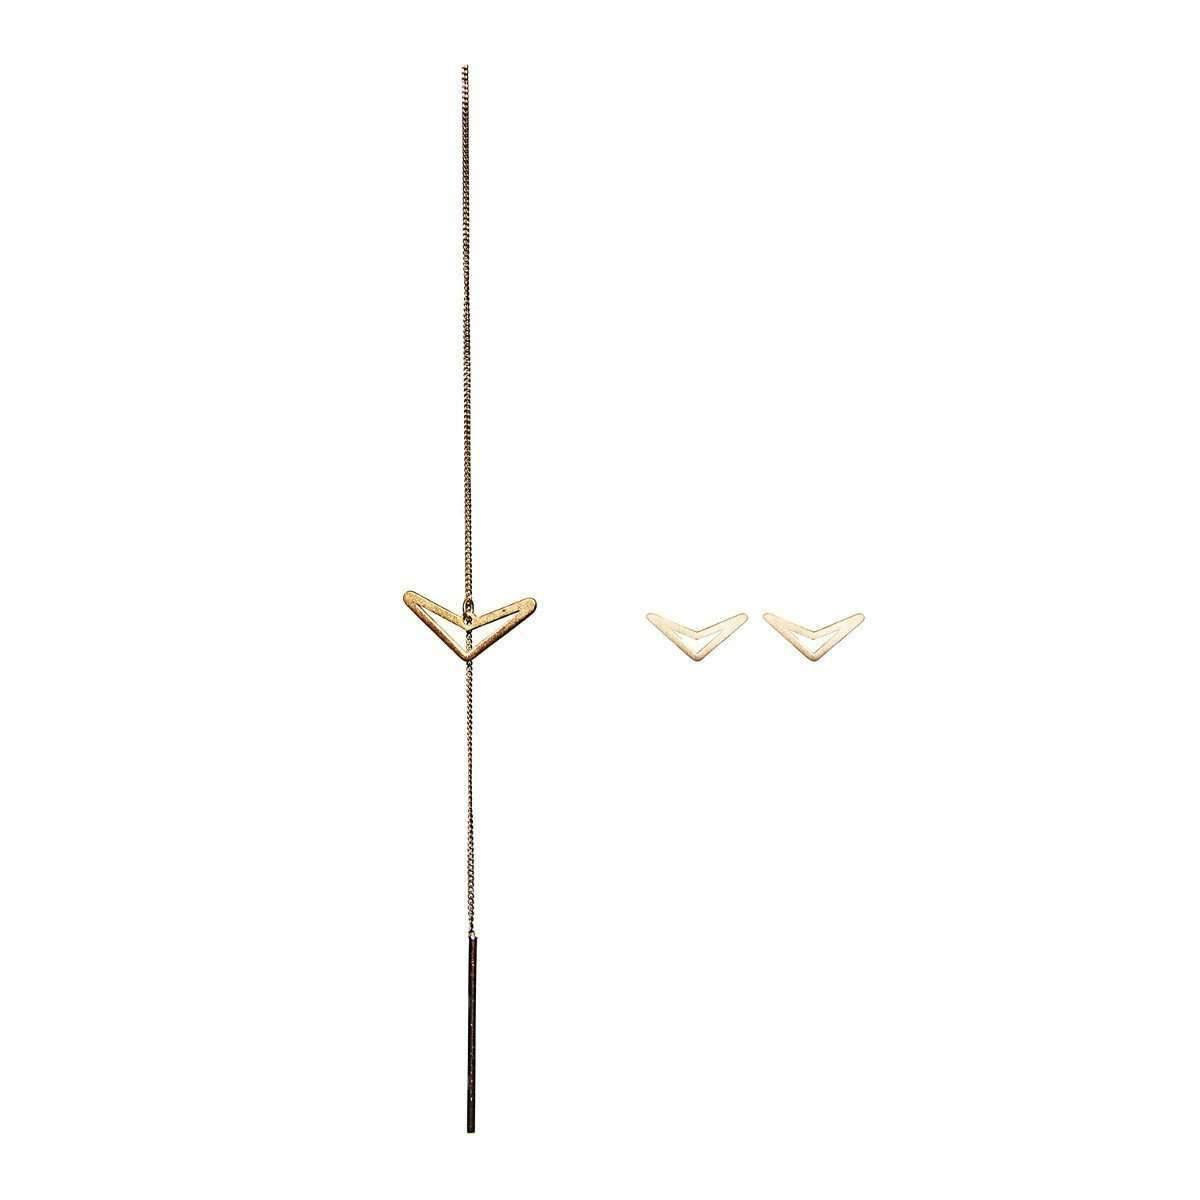 Dutch Basics Gold Plated Set Diamond Shaped Studs & Drop Chain Earring znmkc